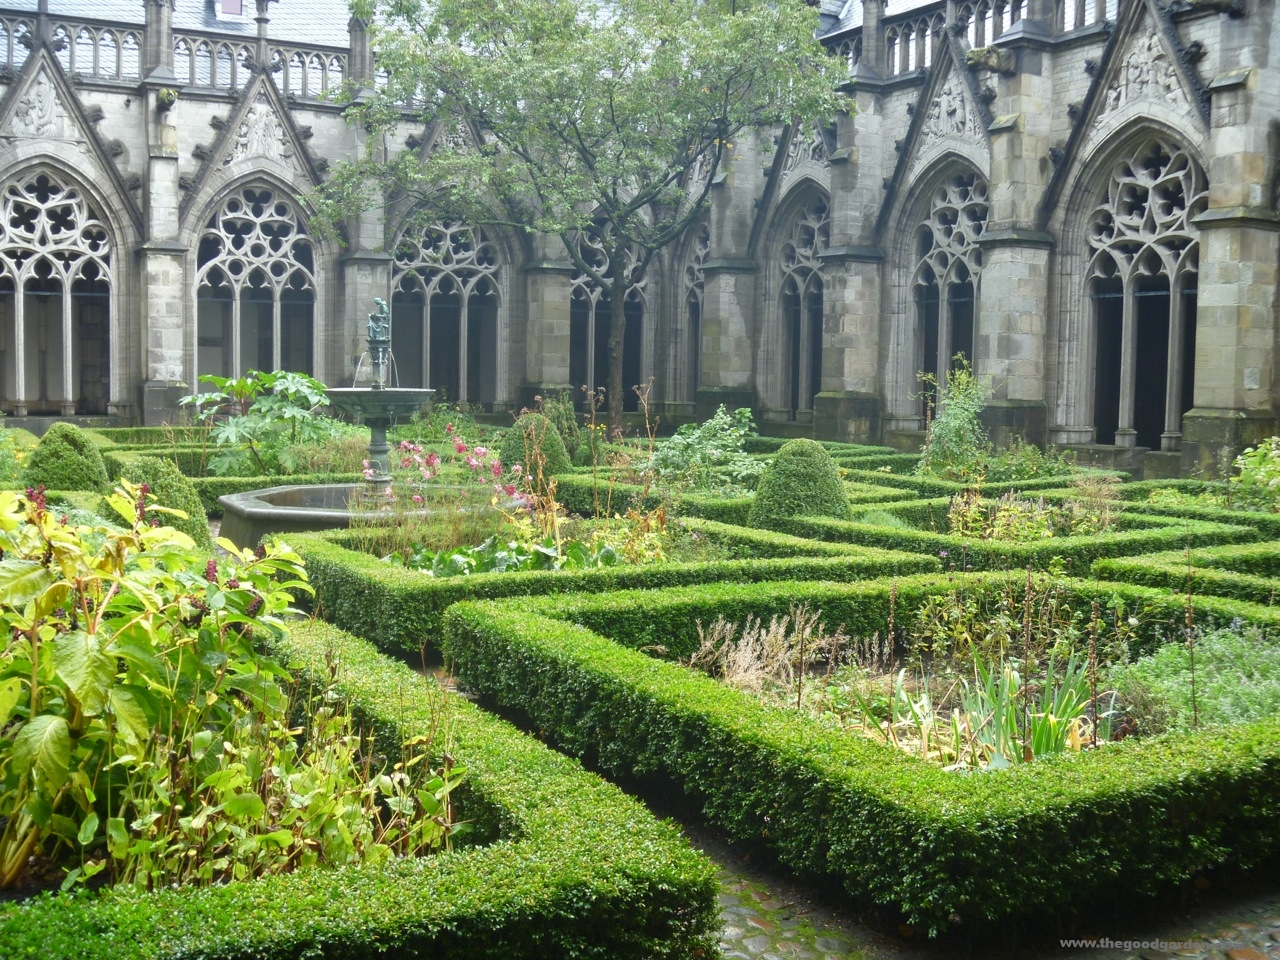 thegoodgarden|utrecht|cloistergarden|30039.jpg